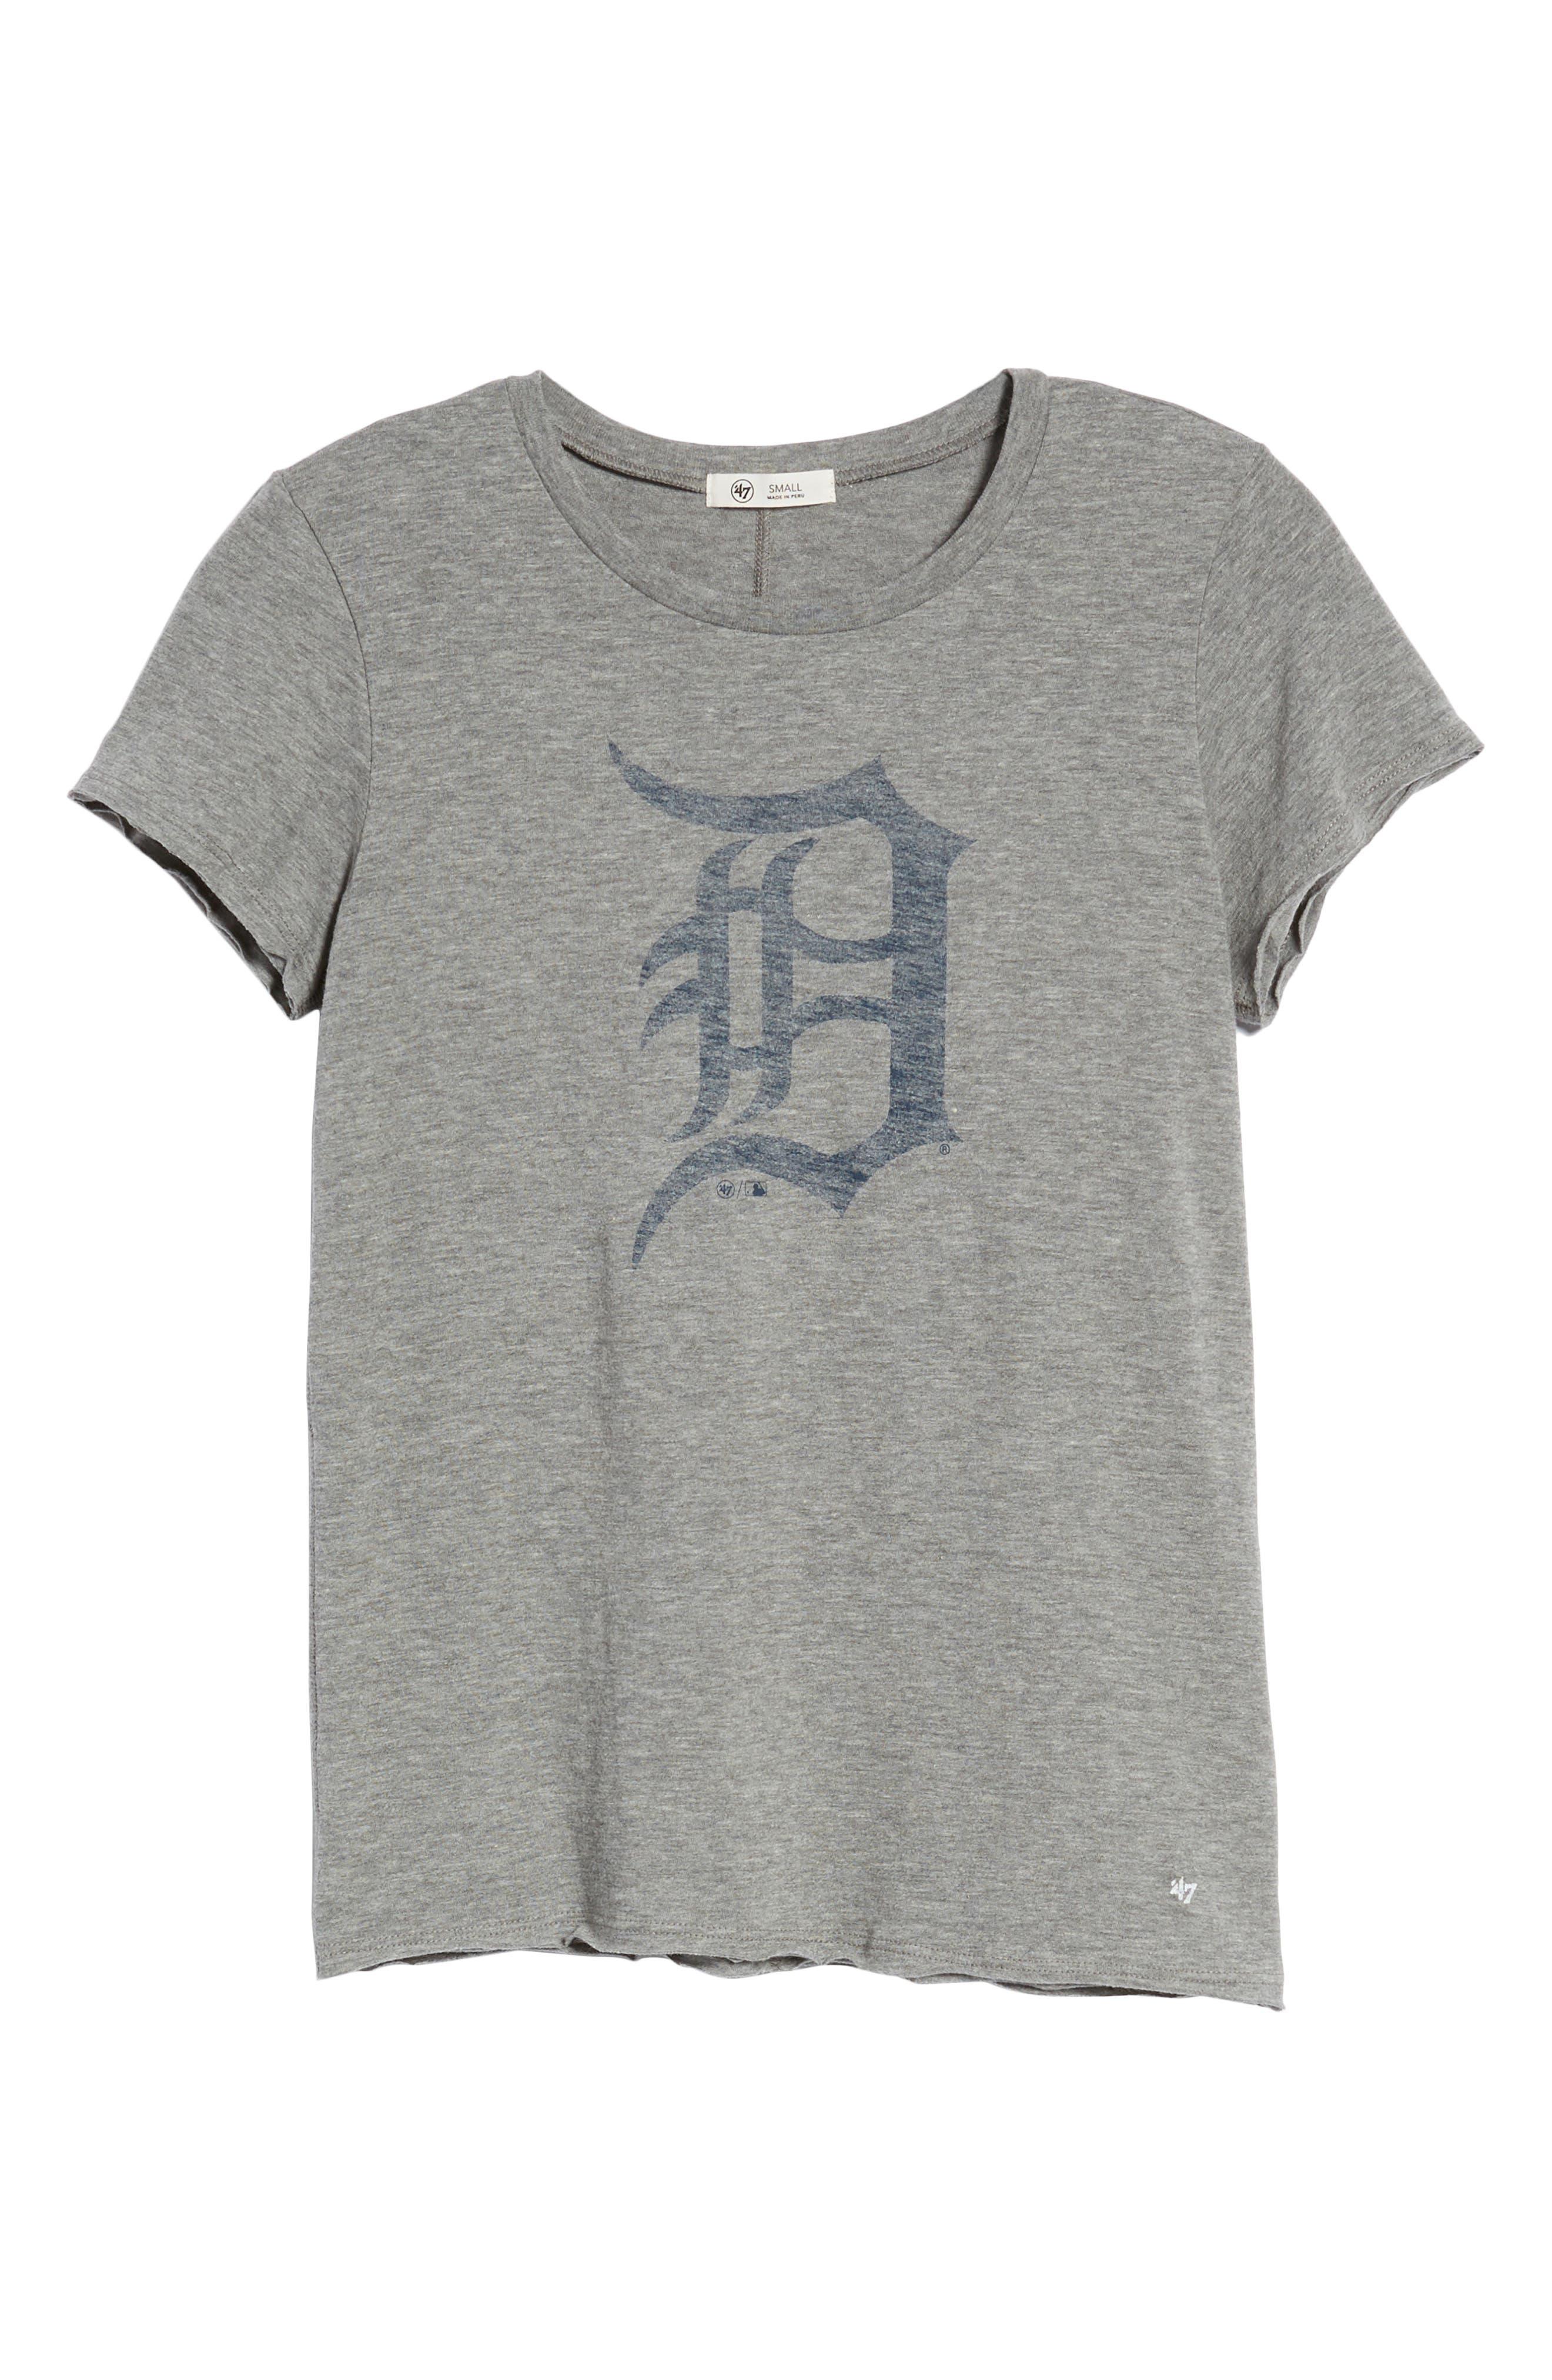 Detroit Tigers Fader Letter Tee,                             Alternate thumbnail 7, color,                             Slate Grey